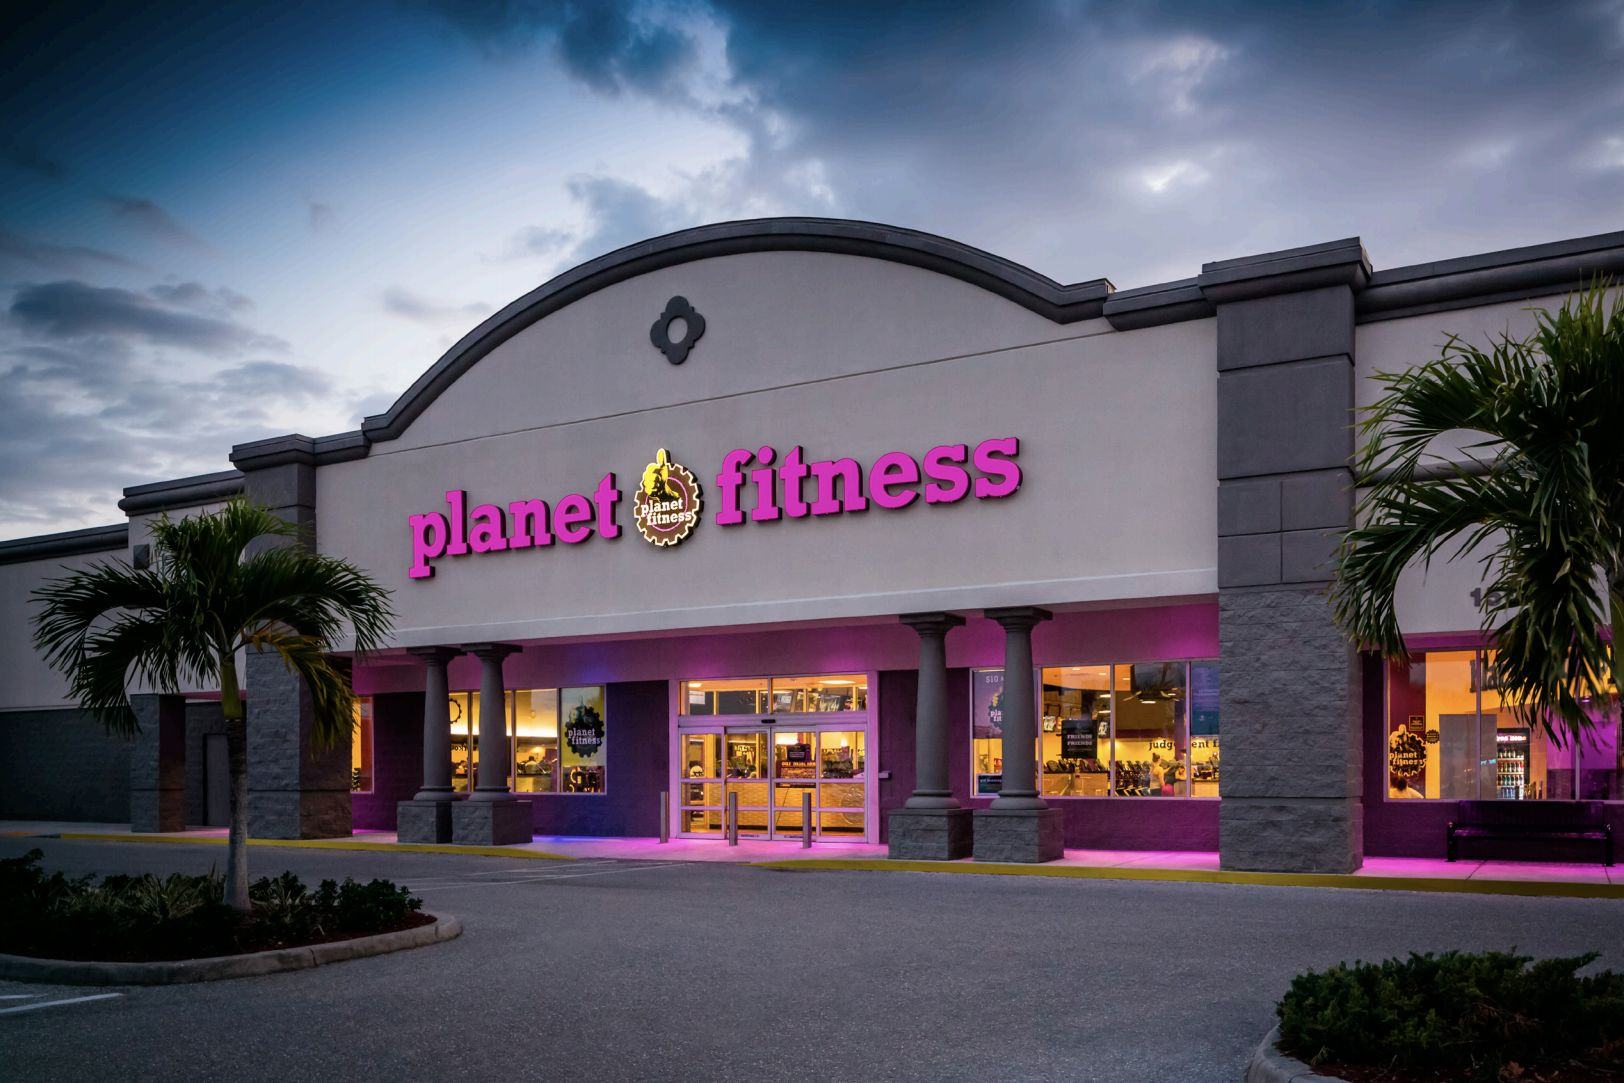 Planet fitness fypnfj